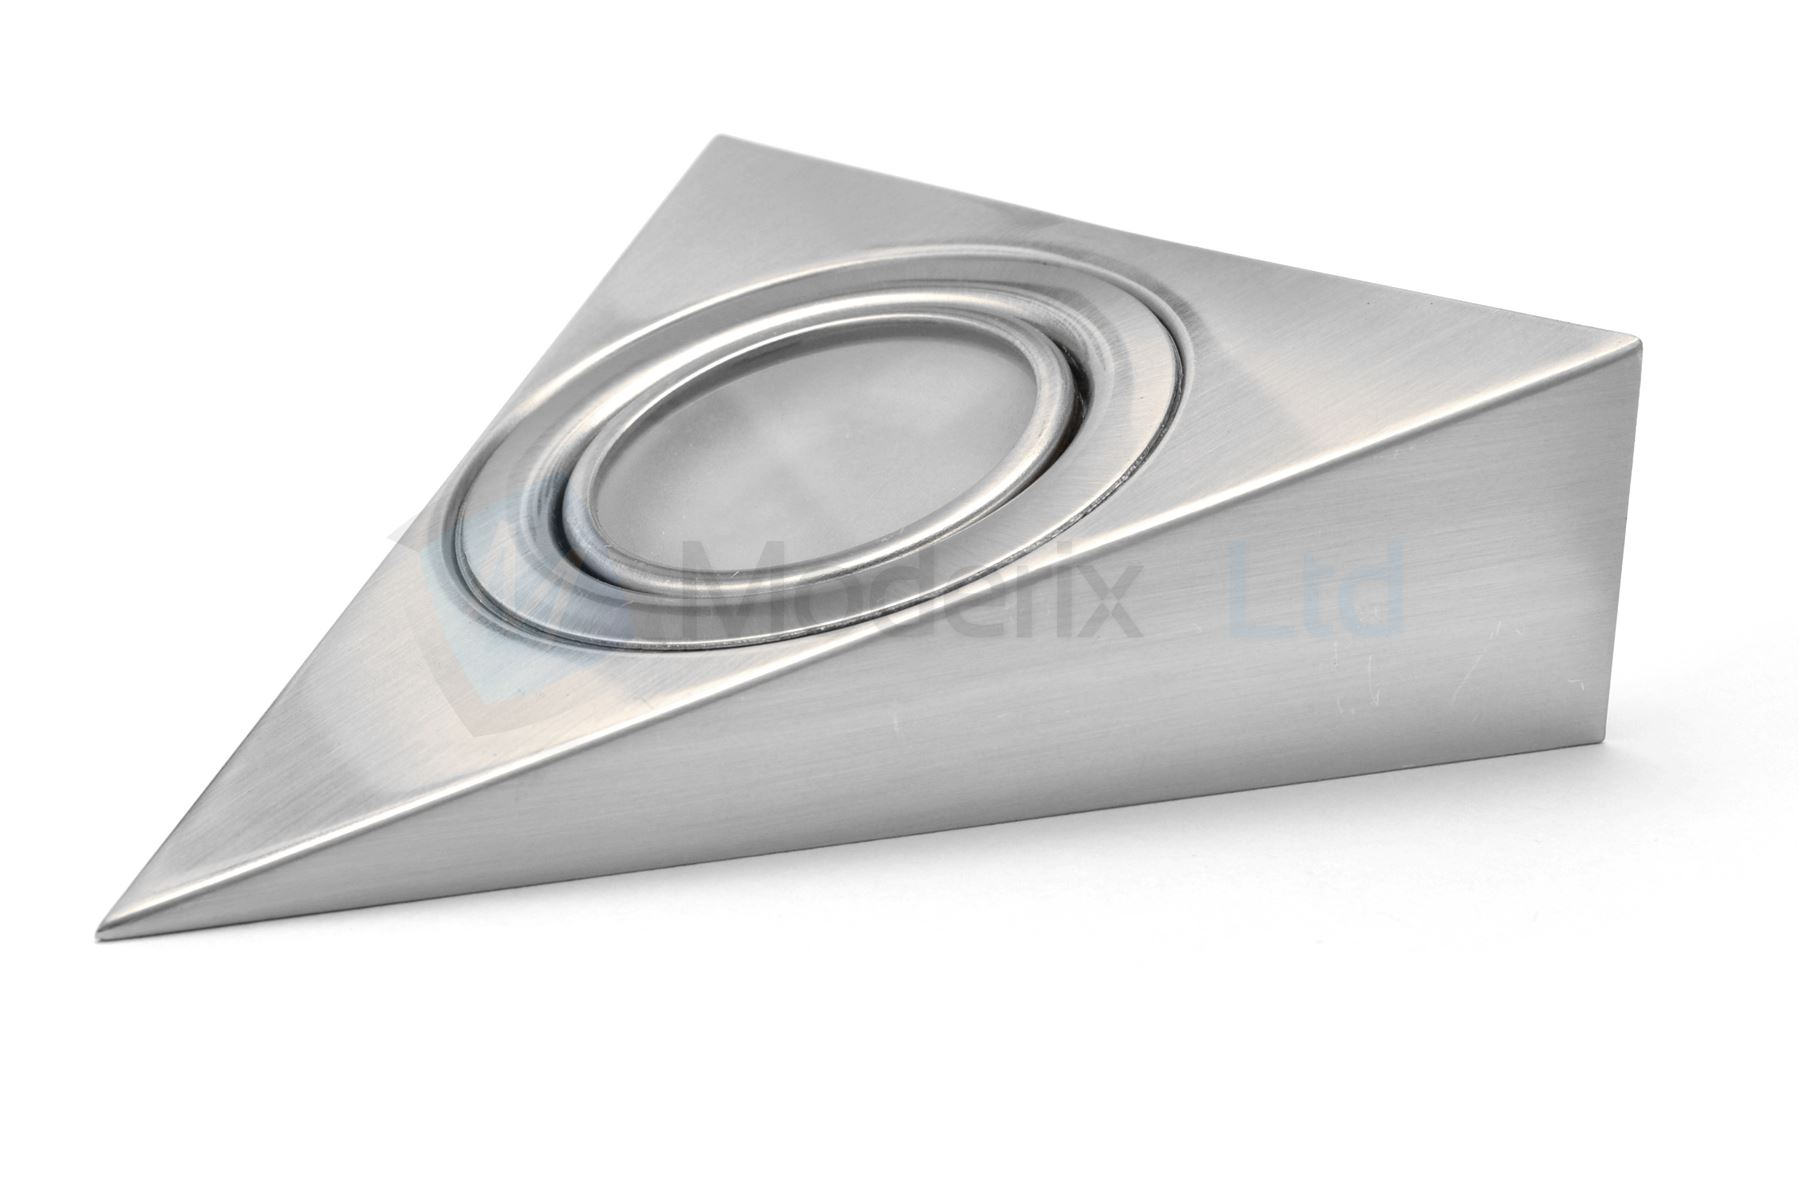 triangle kitchen under cupboard cabinet shelf down light halogen 20w ebay. Black Bedroom Furniture Sets. Home Design Ideas